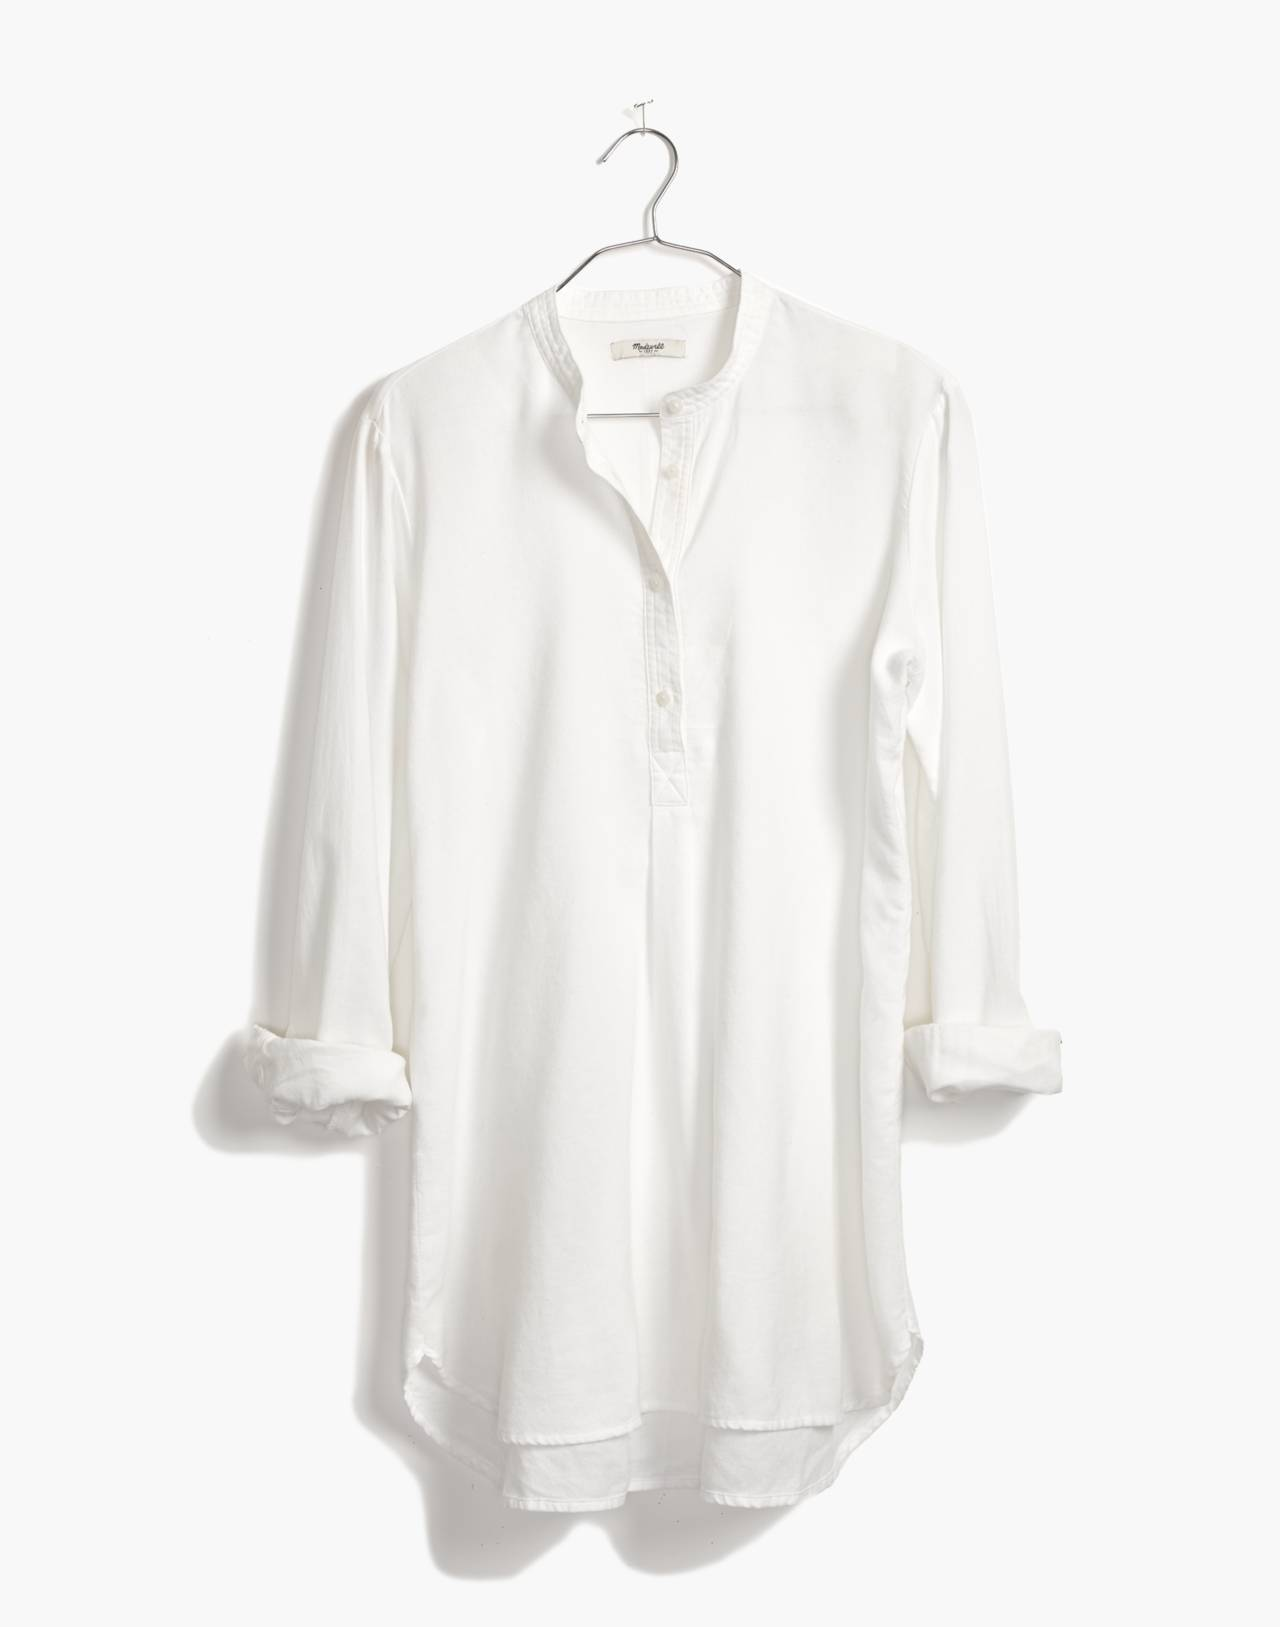 Wellspring Tunic Popover Shirt in eyelet white image 4